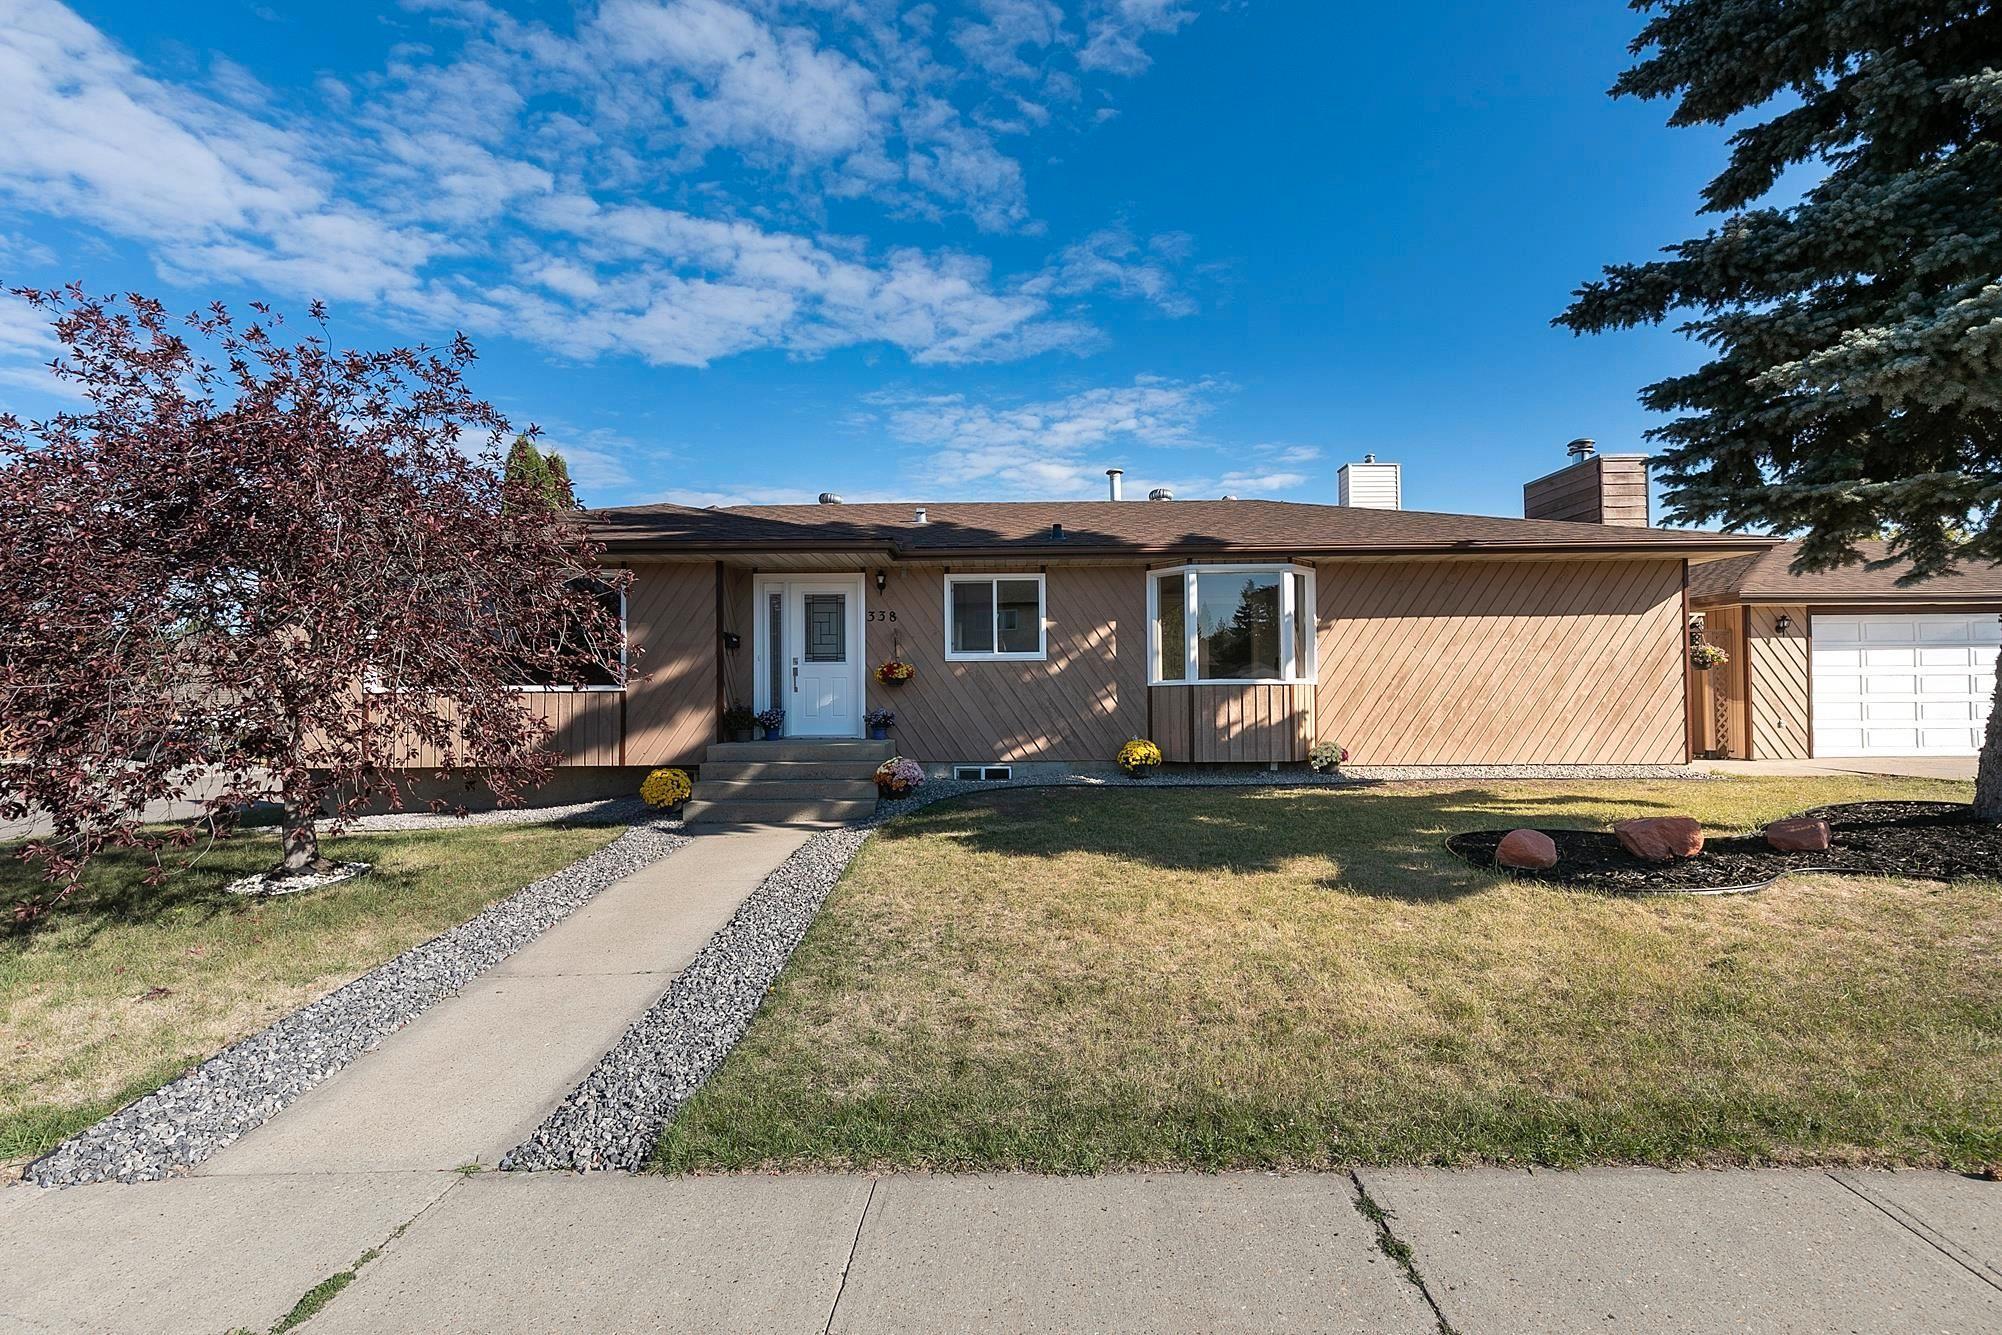 Main Photo: 338 GRAND MEADOW Crescent in Edmonton: Zone 29 House for sale : MLS®# E4260866